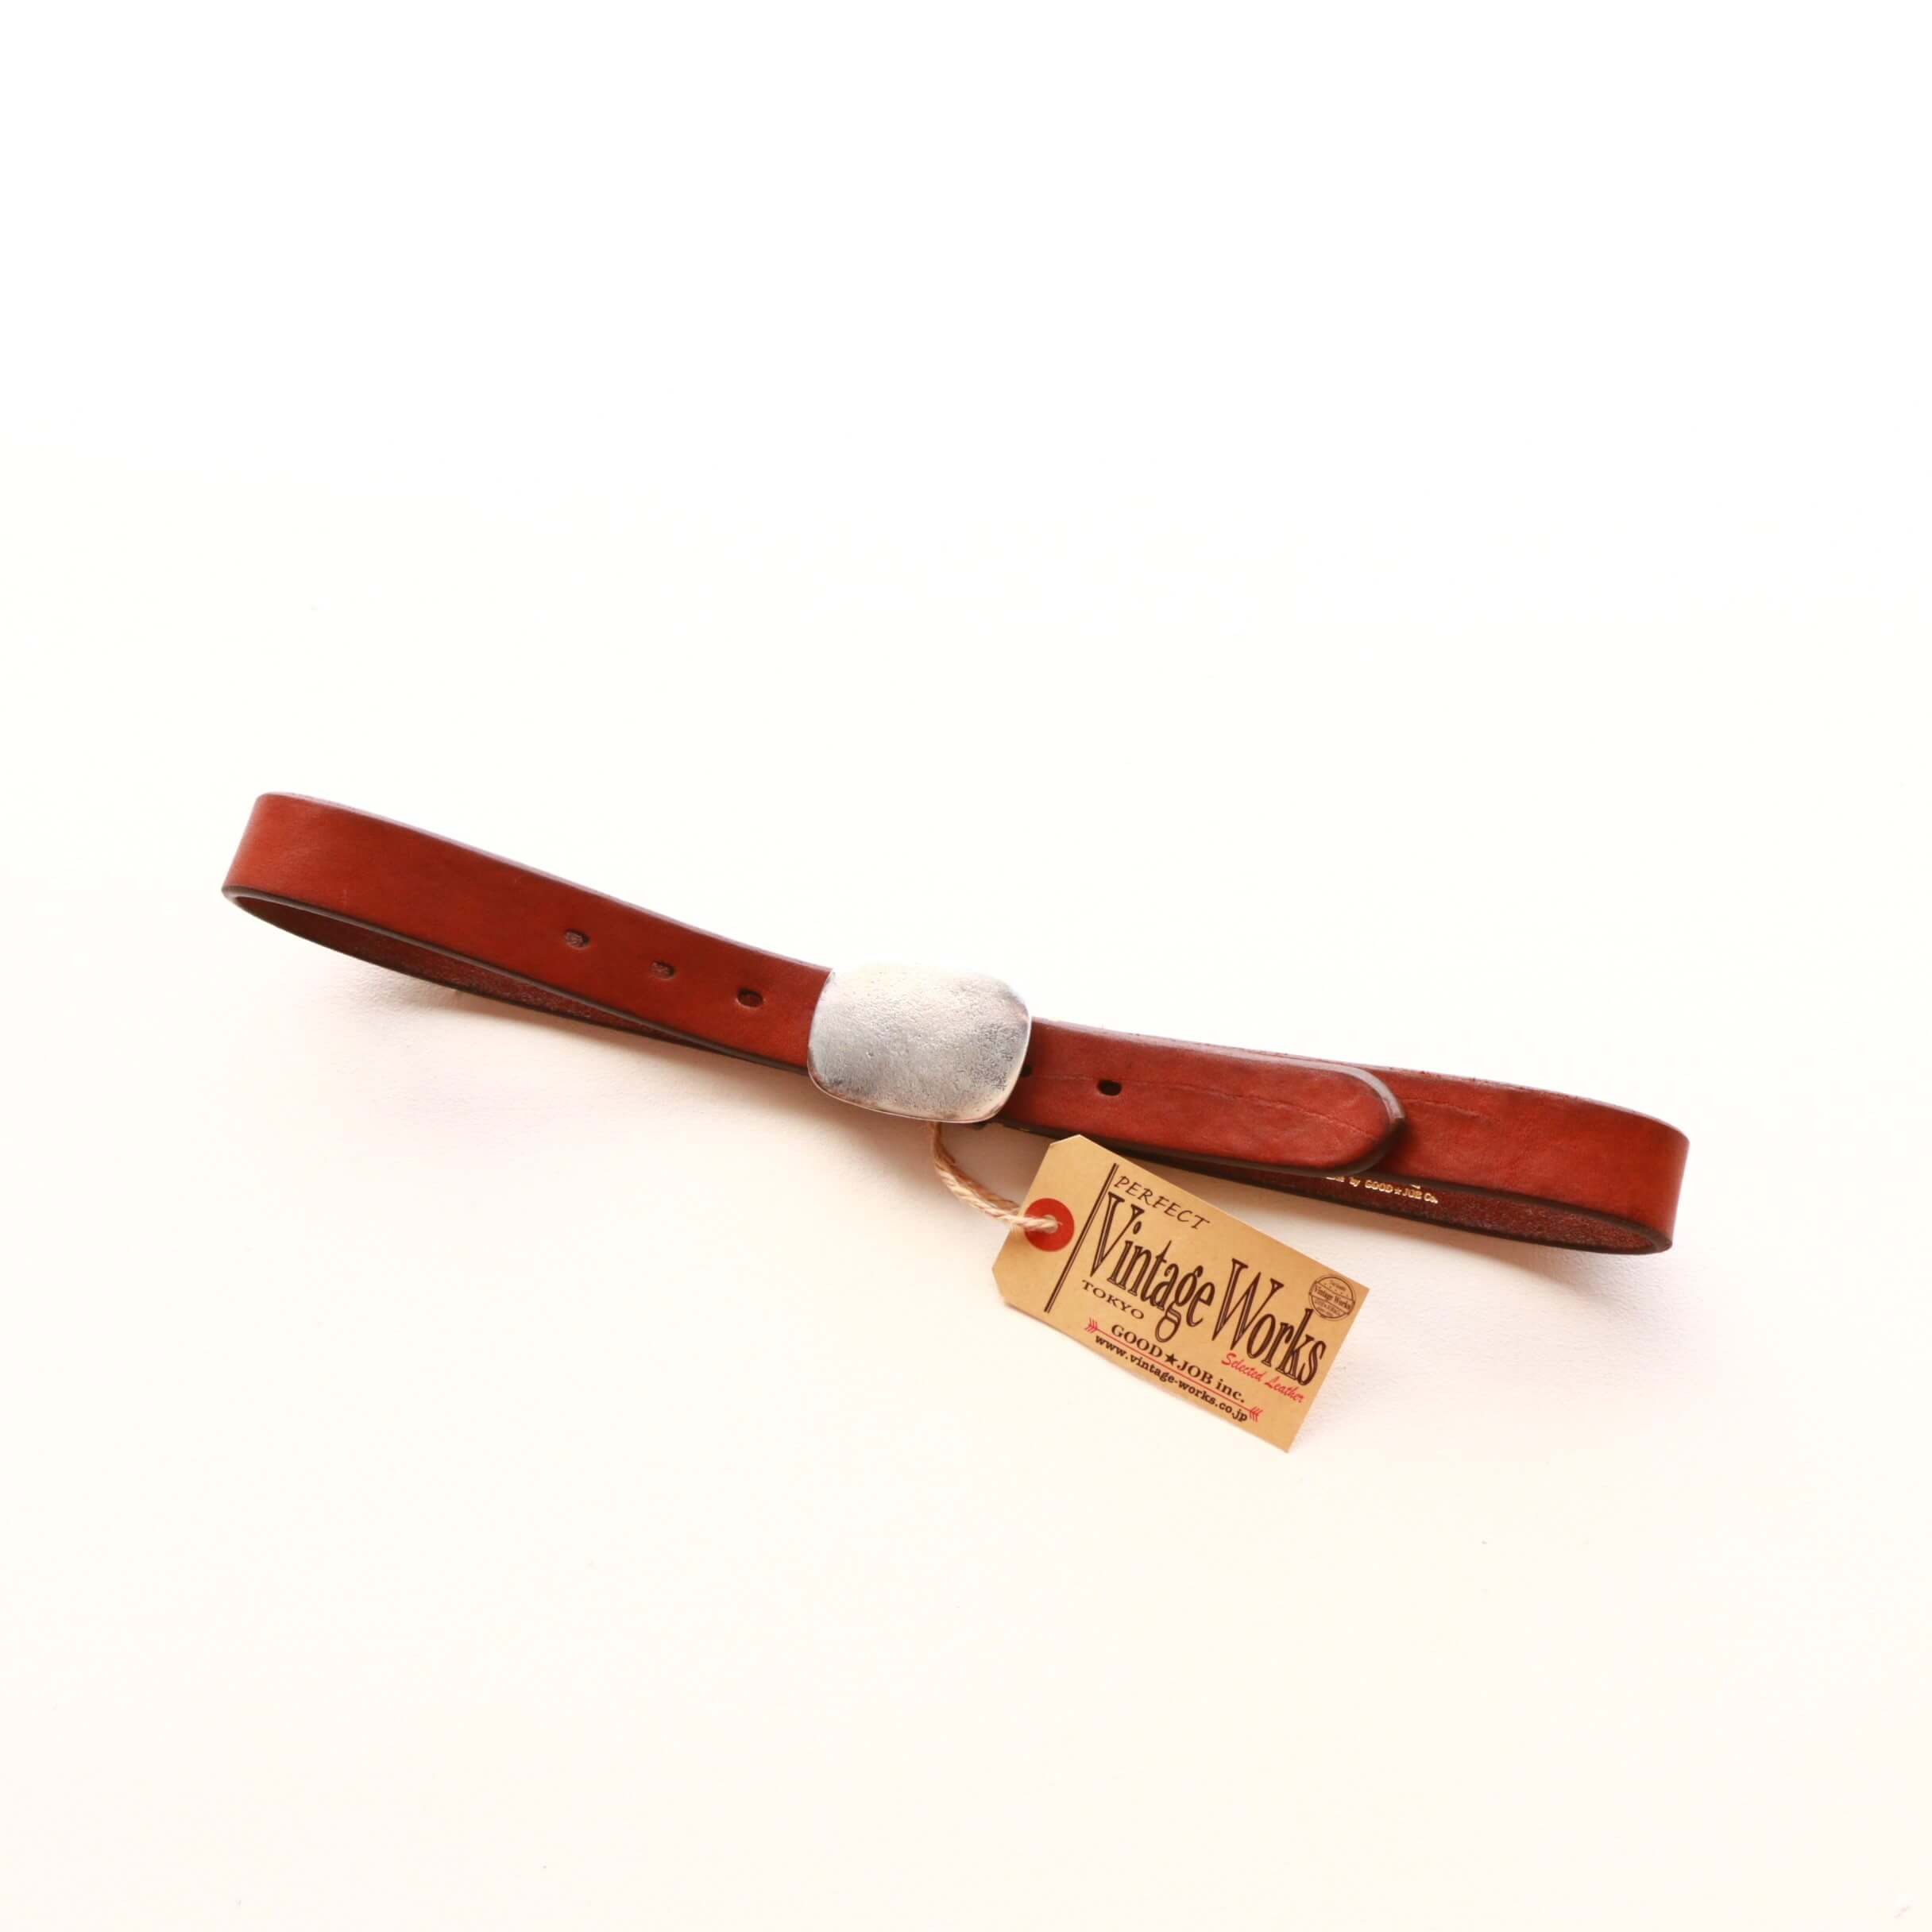 Vintage Works ヴィンテージワークス Leather belt レザーベルト DH5717